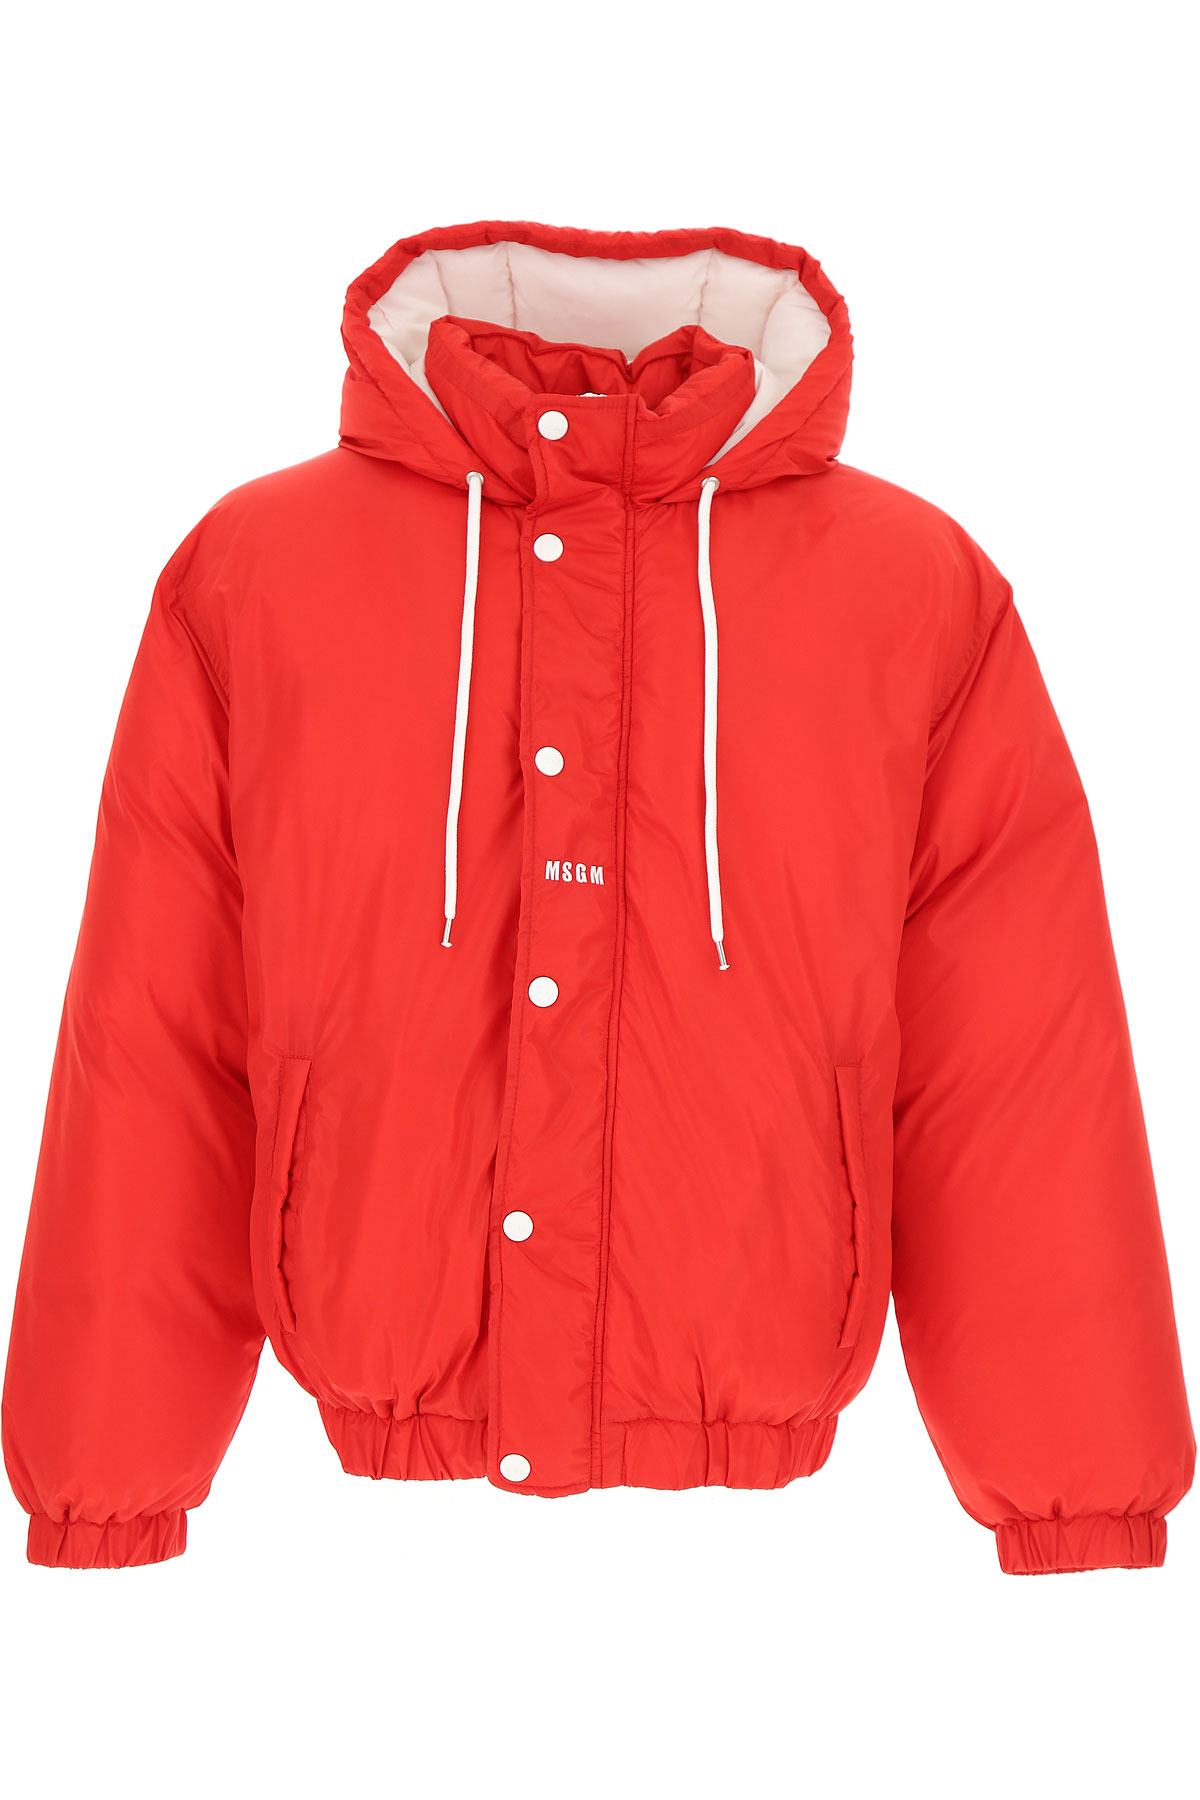 Image of MSGM Down Jacket for Men, Puffer Ski Jacket, Red, polyamide, 2017, L M S XS